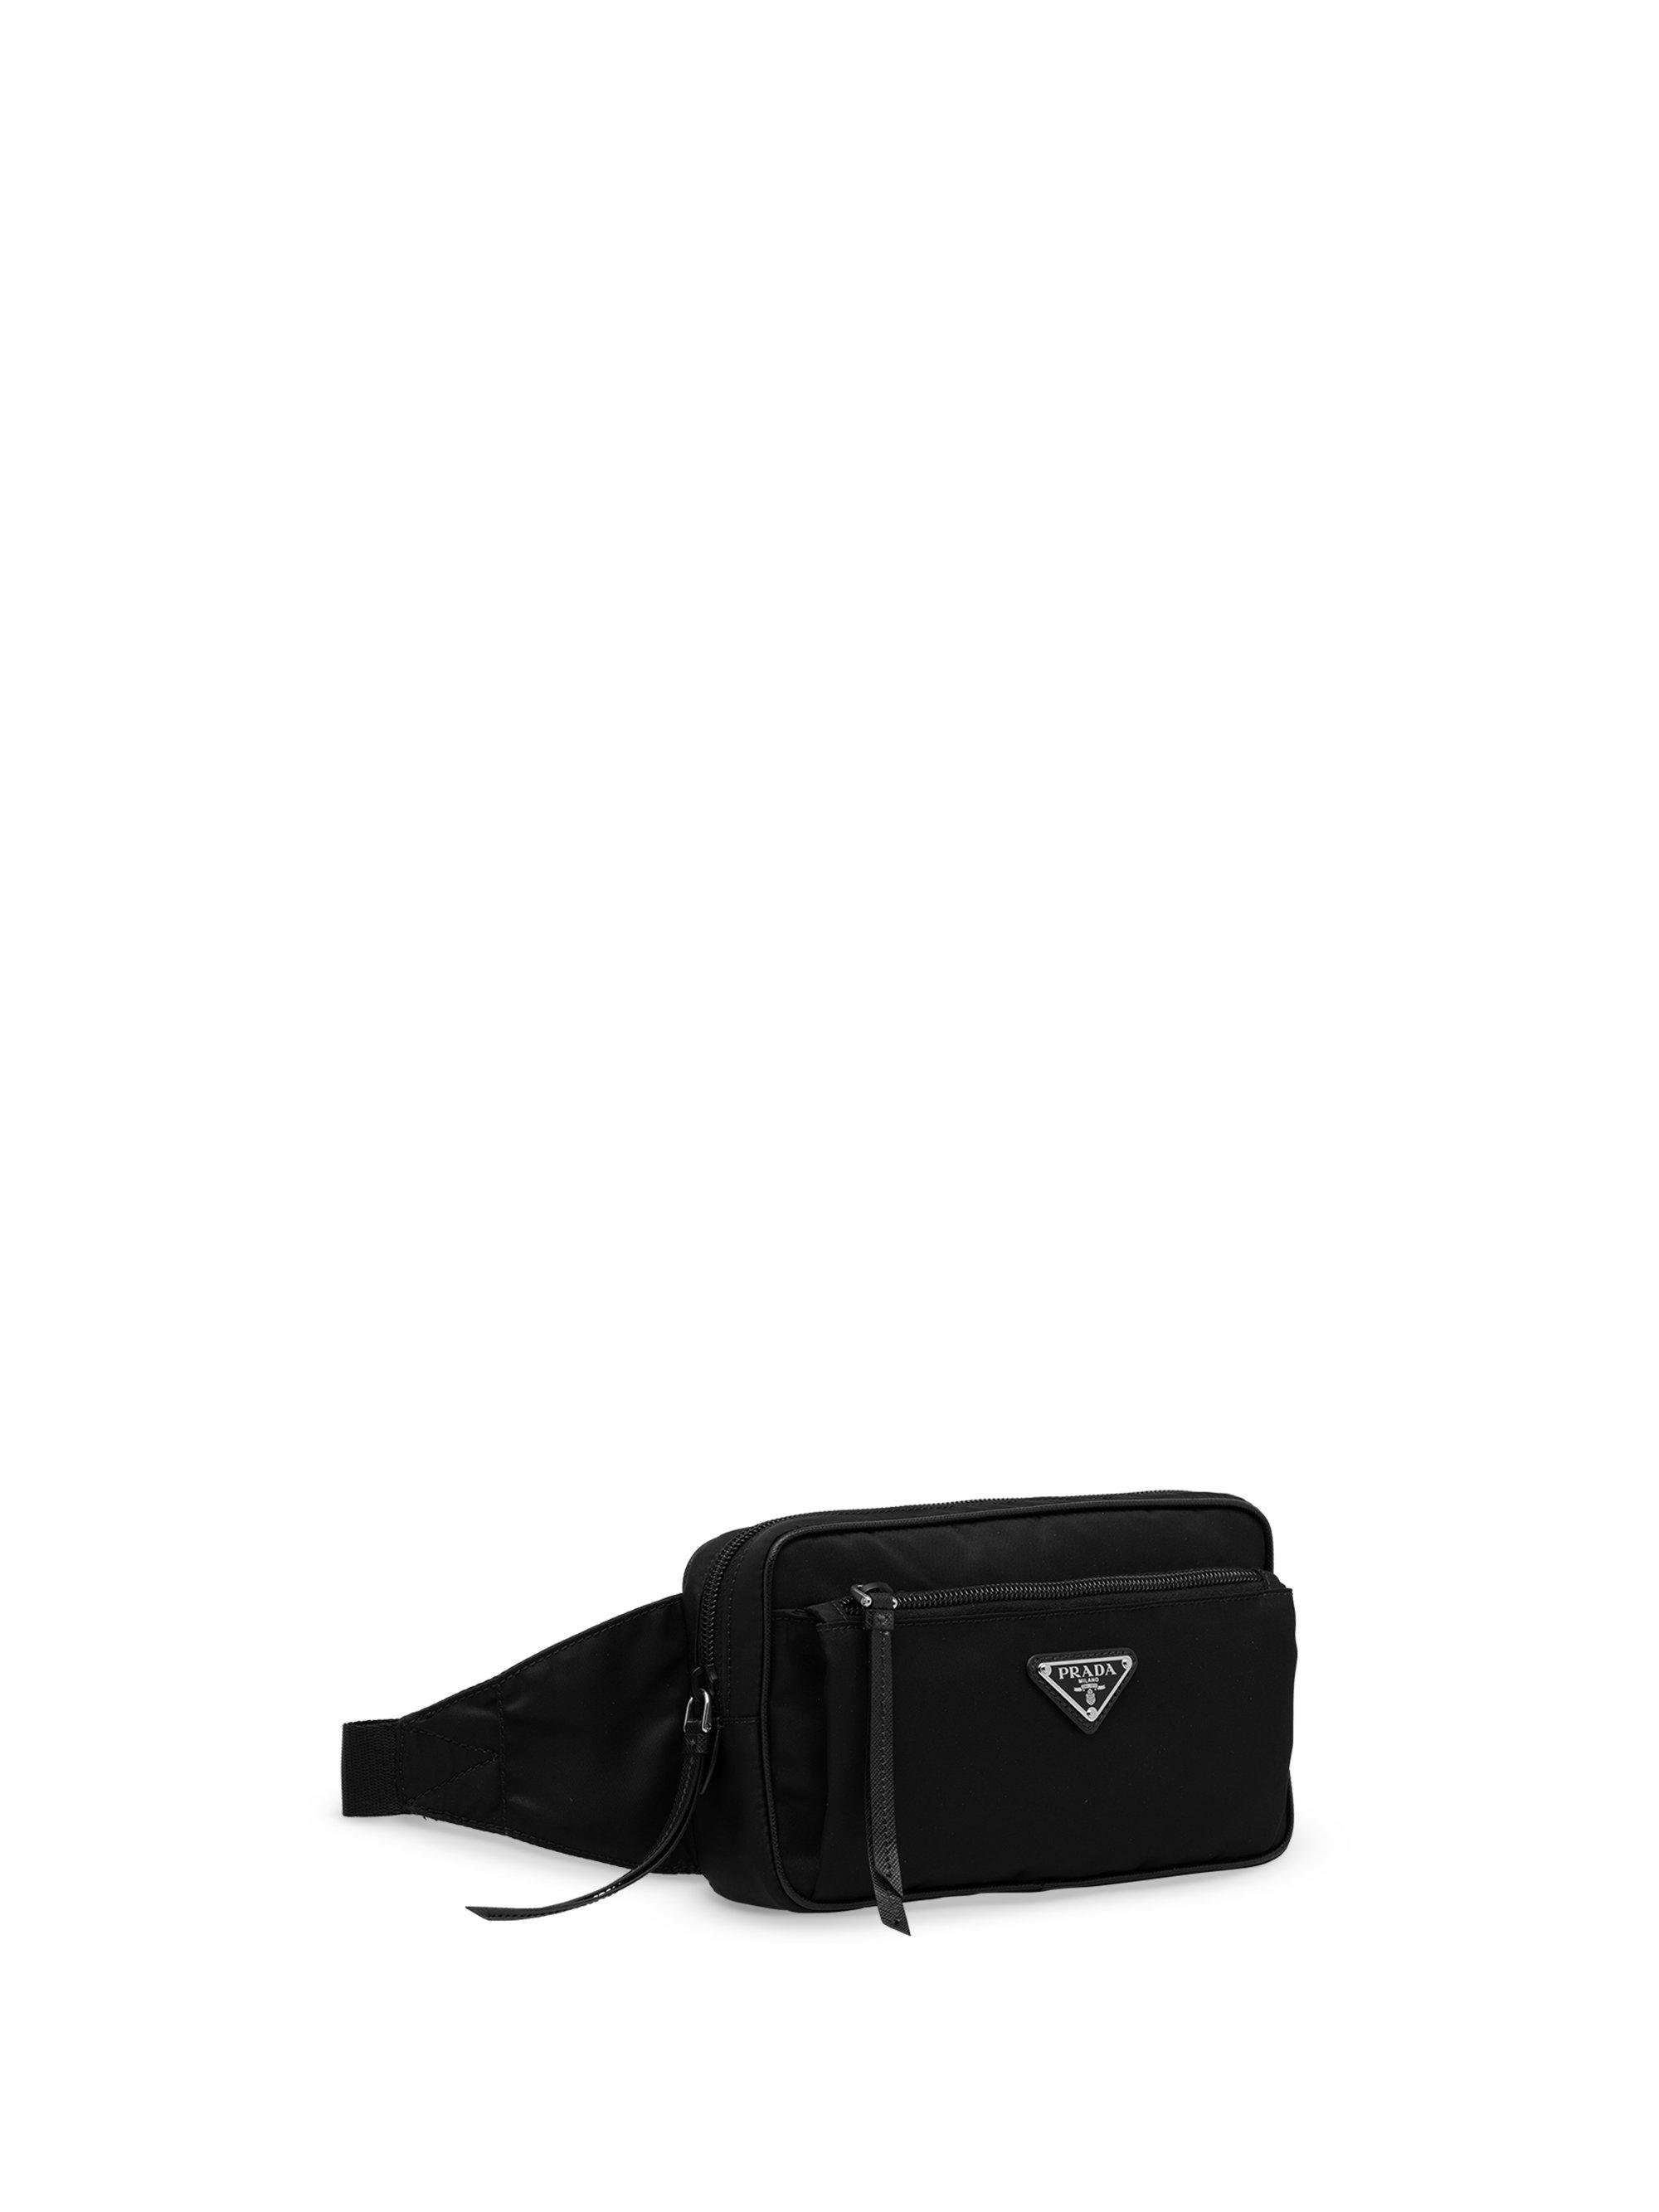 ... cheap prada black nylon belt bag lyst. view fullscreen 876b2 73d48 ba3935f1985b6